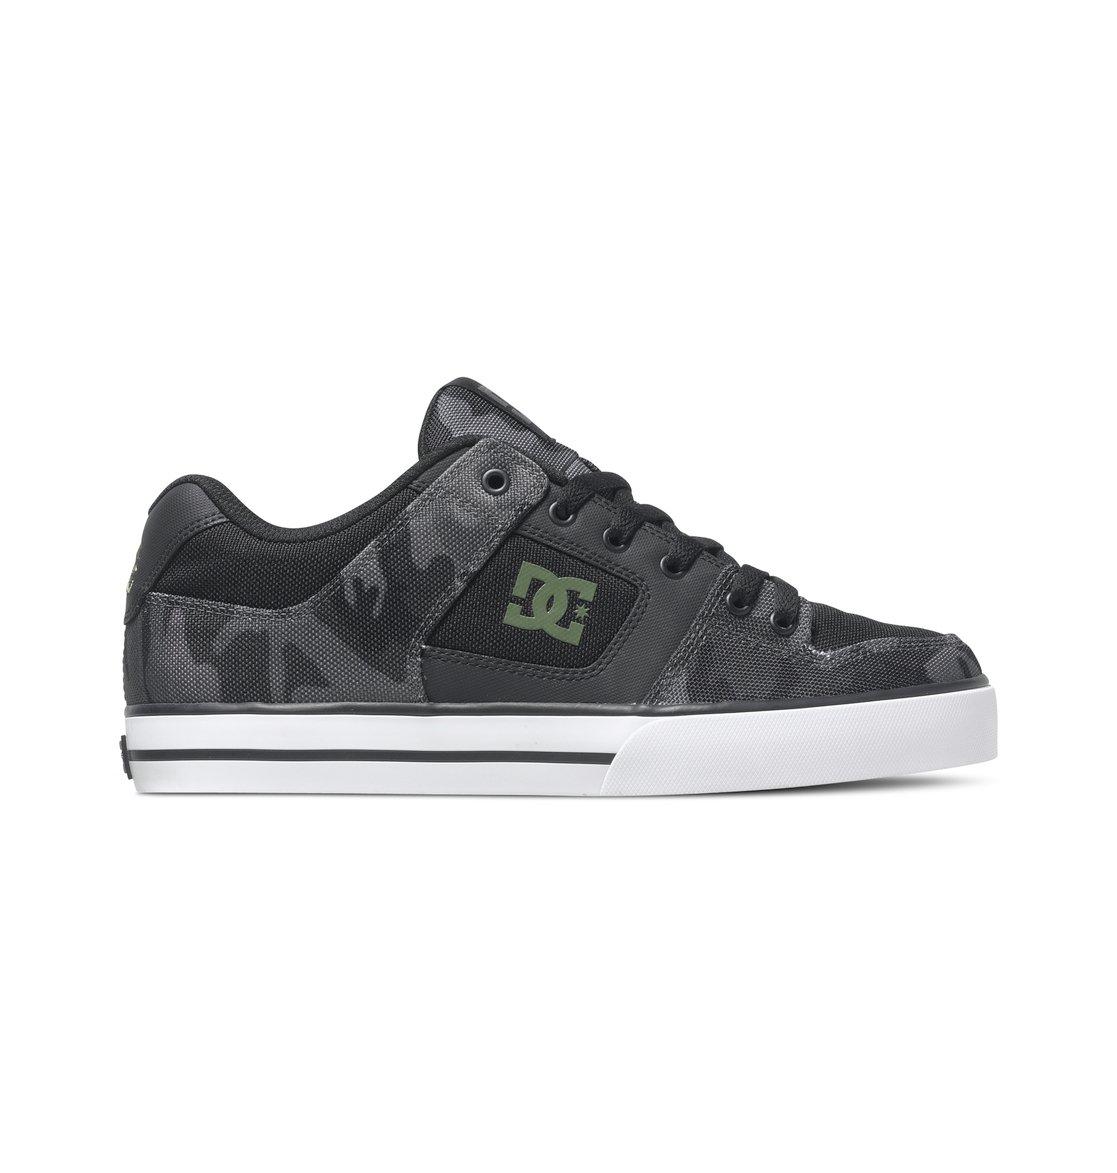 Dc Shoes Mens Skate Shoes Black/Camo Print